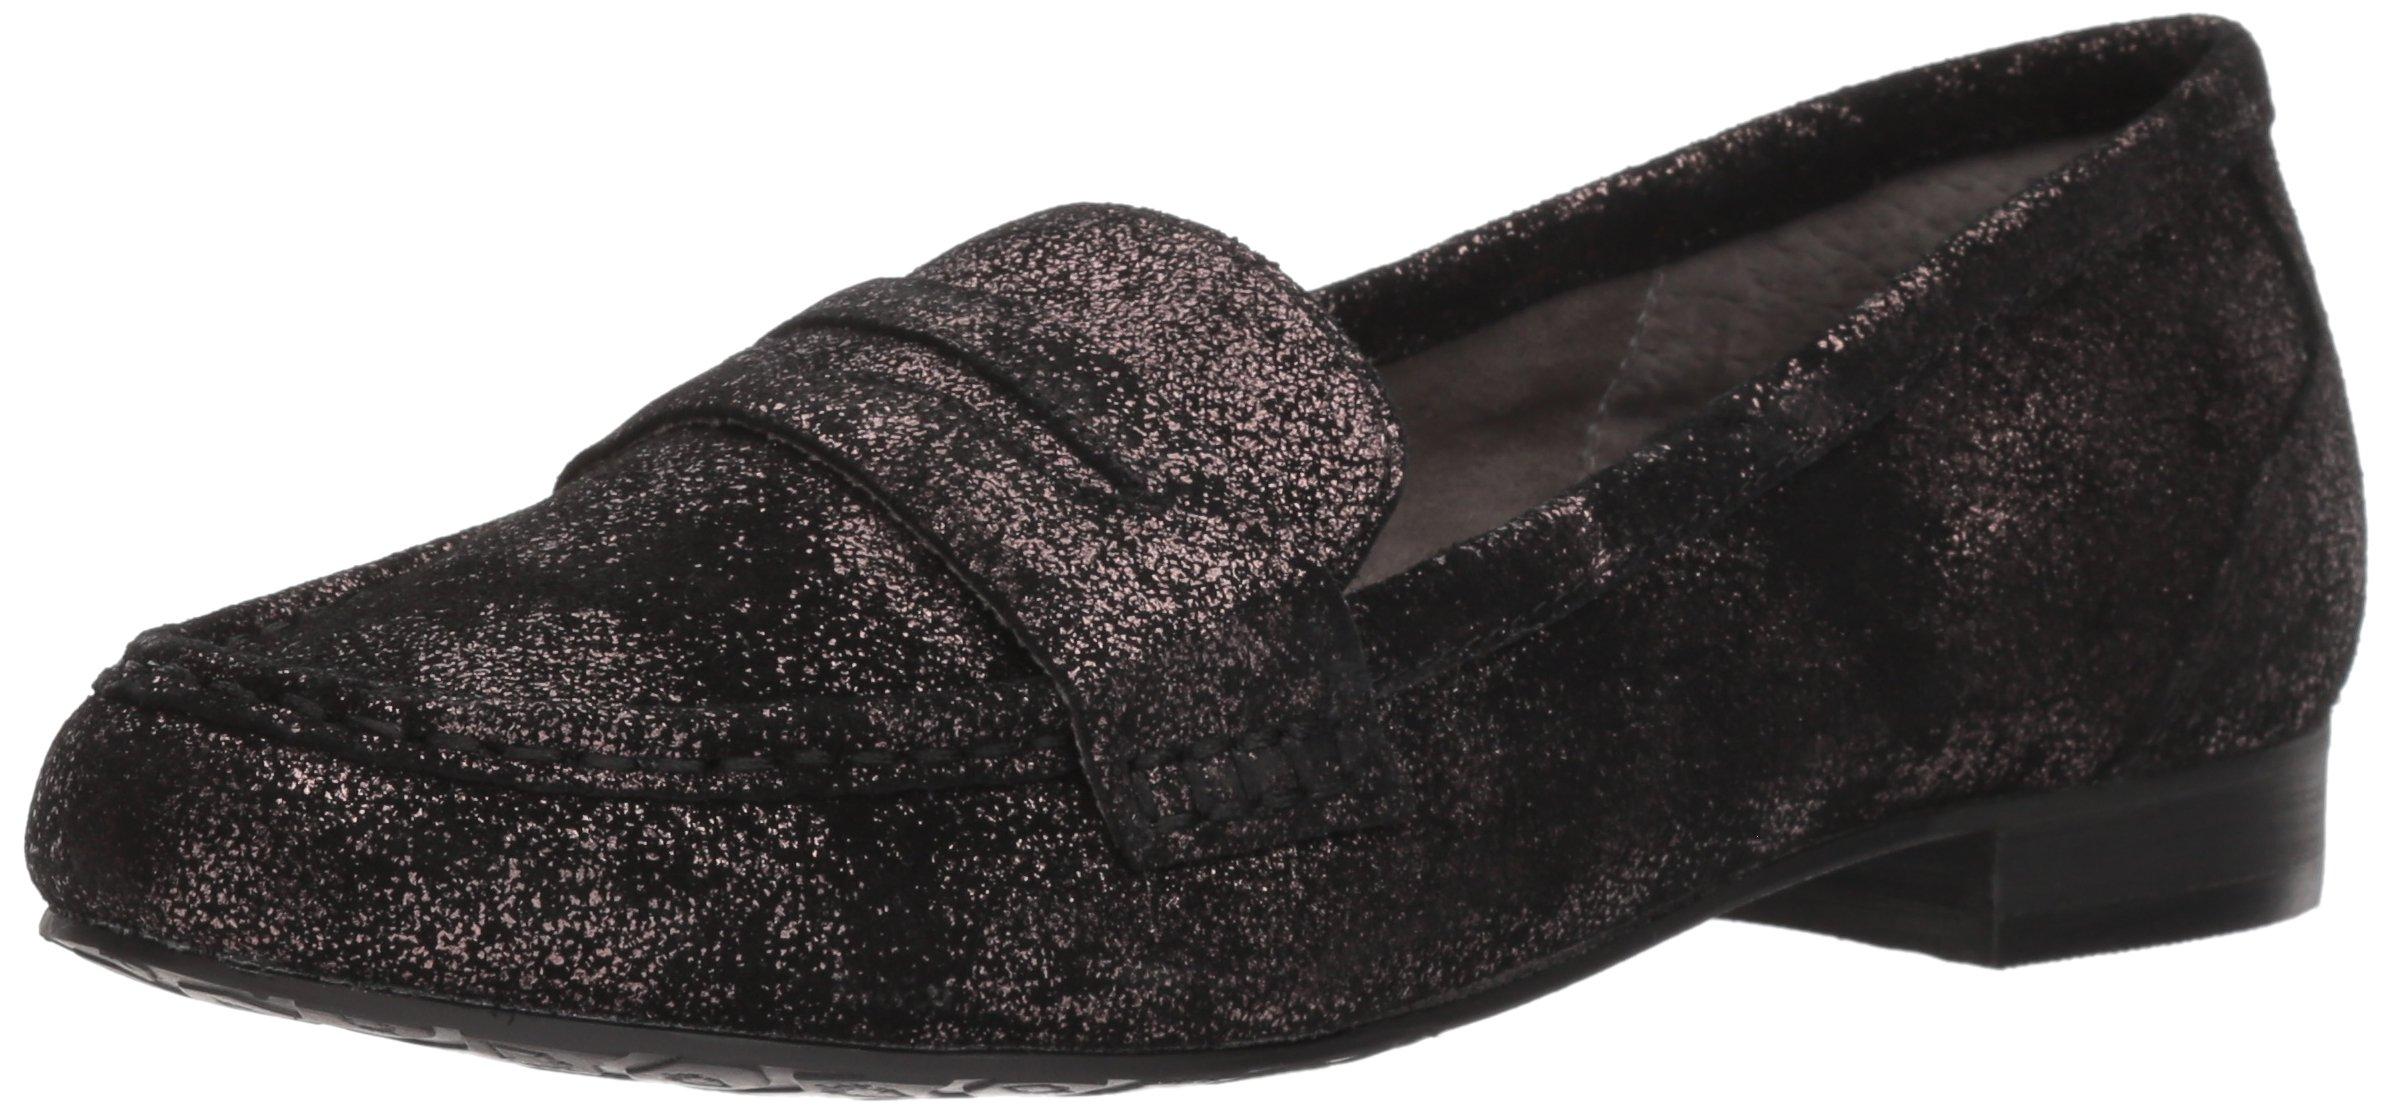 Volatile Women's lucienne Loafer, Black, 10 M US